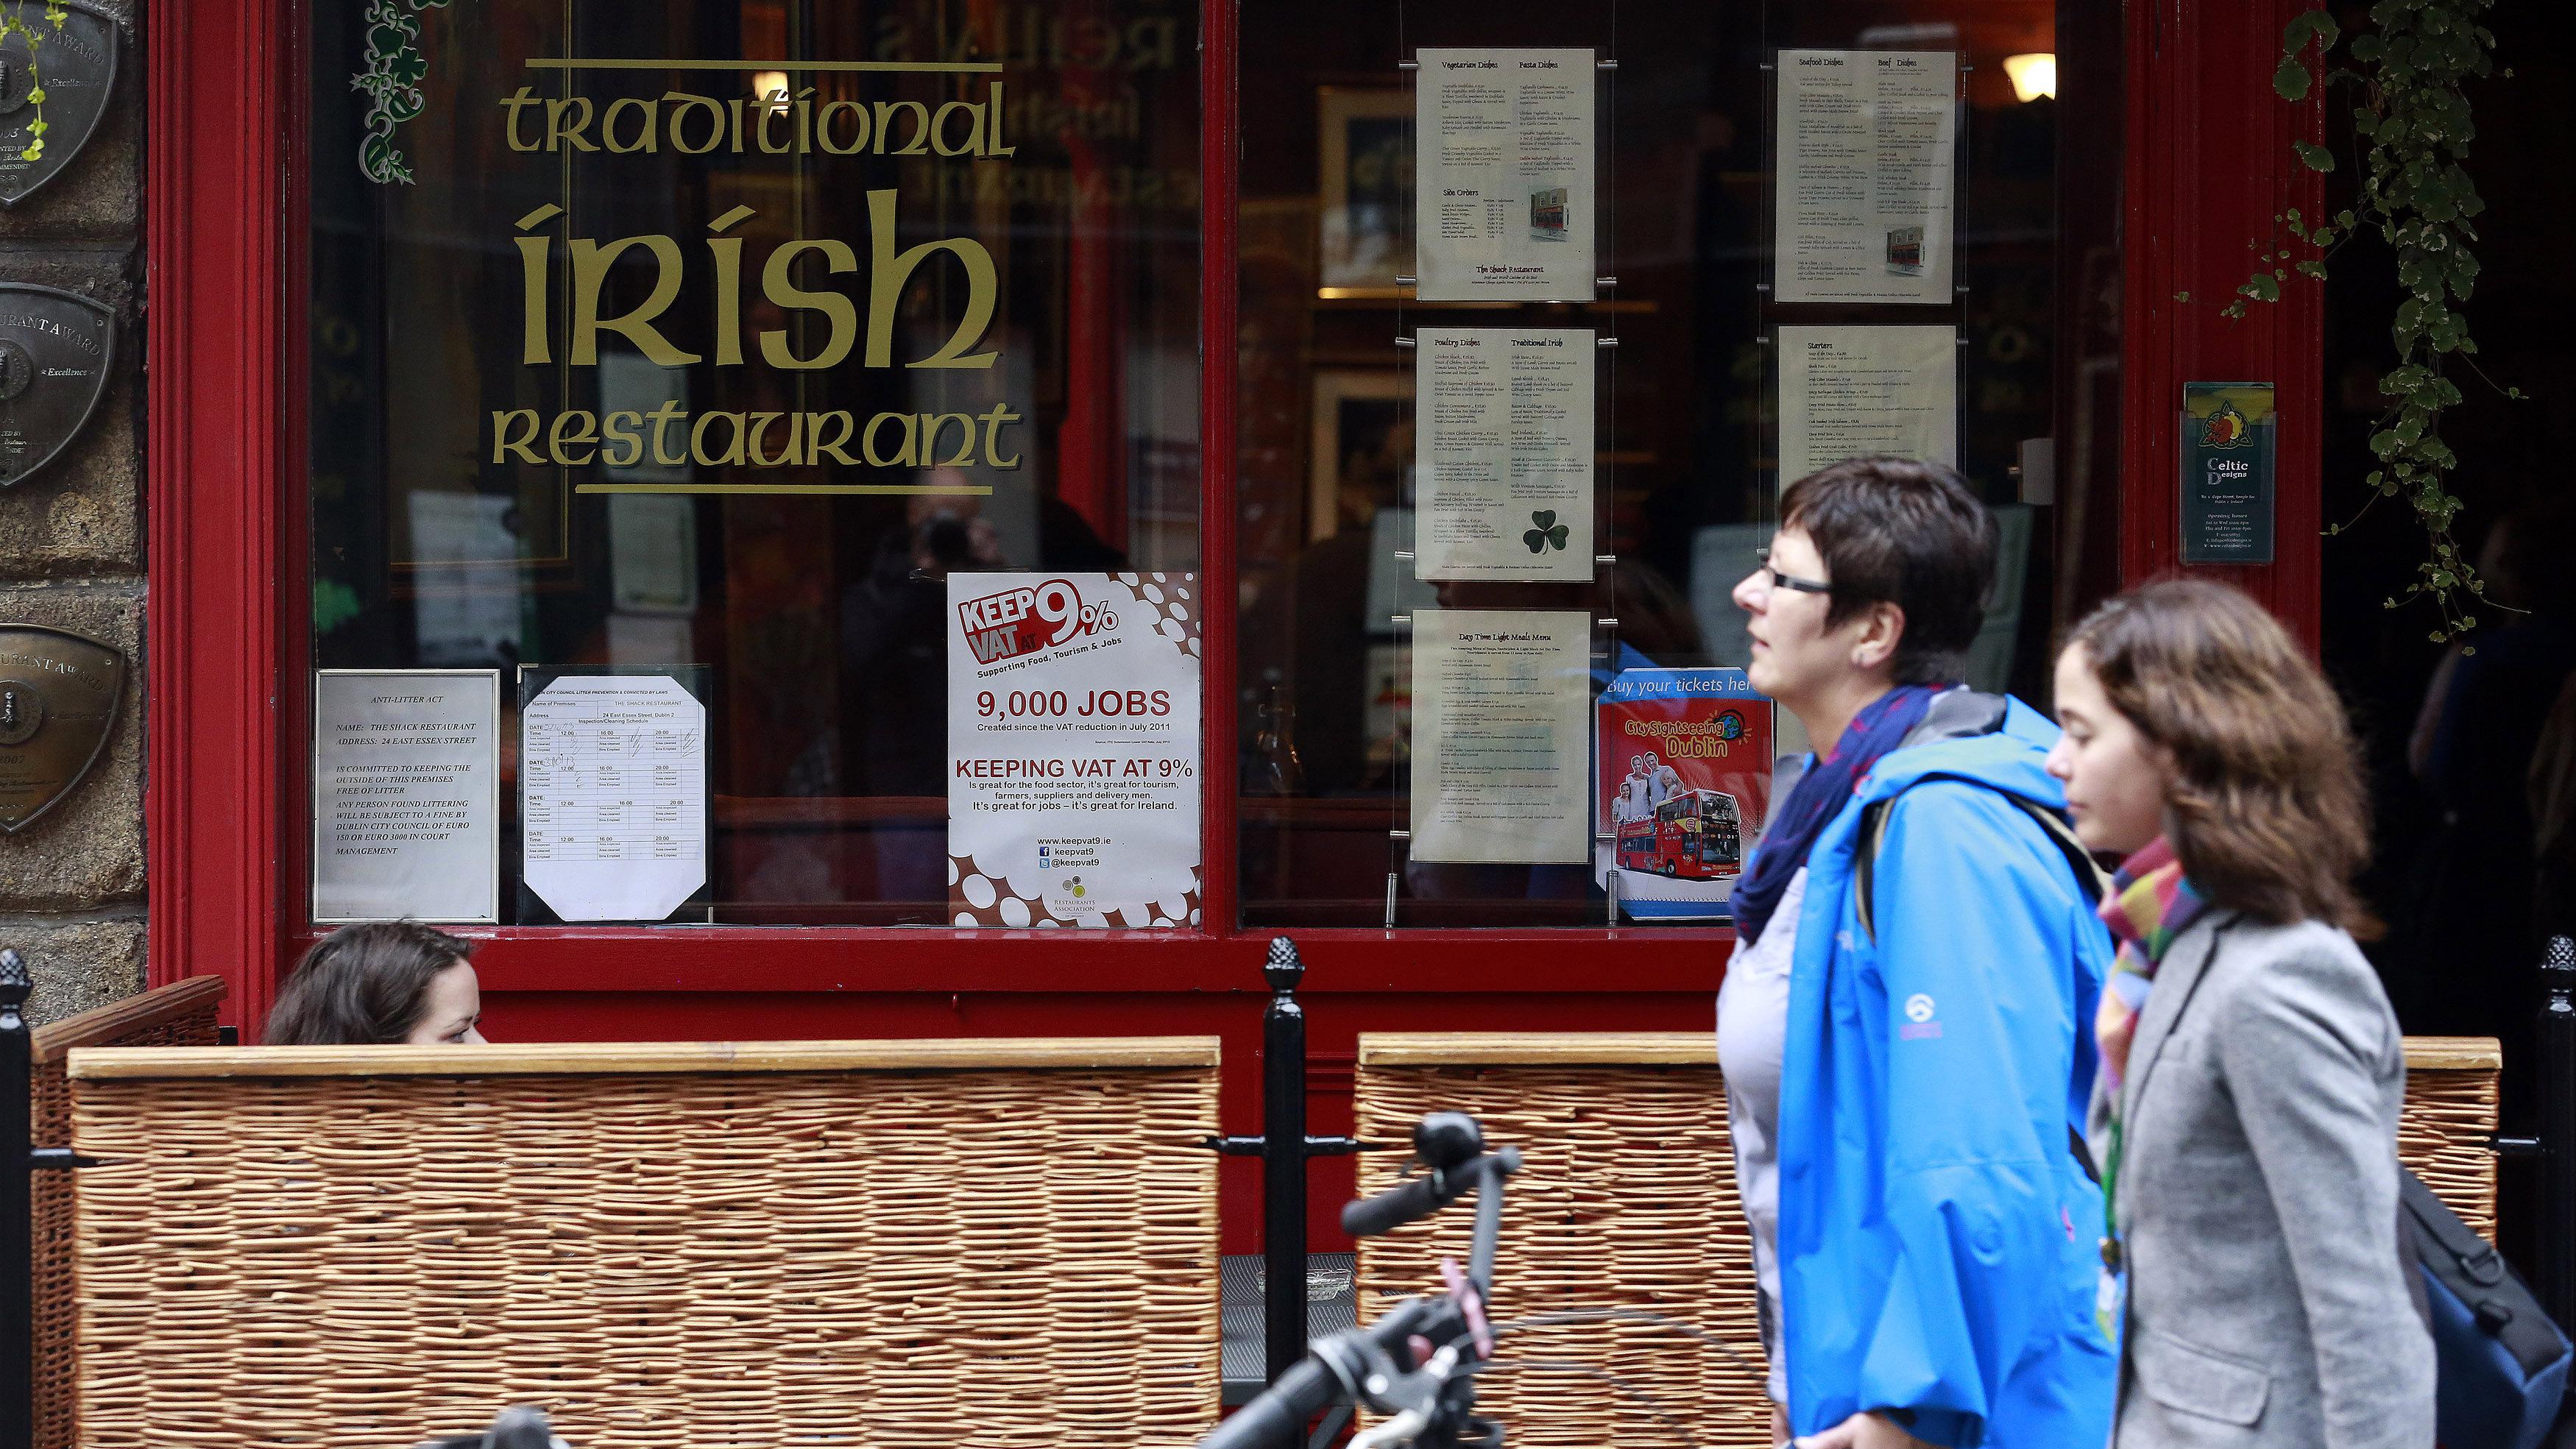 traditional irish restaurant